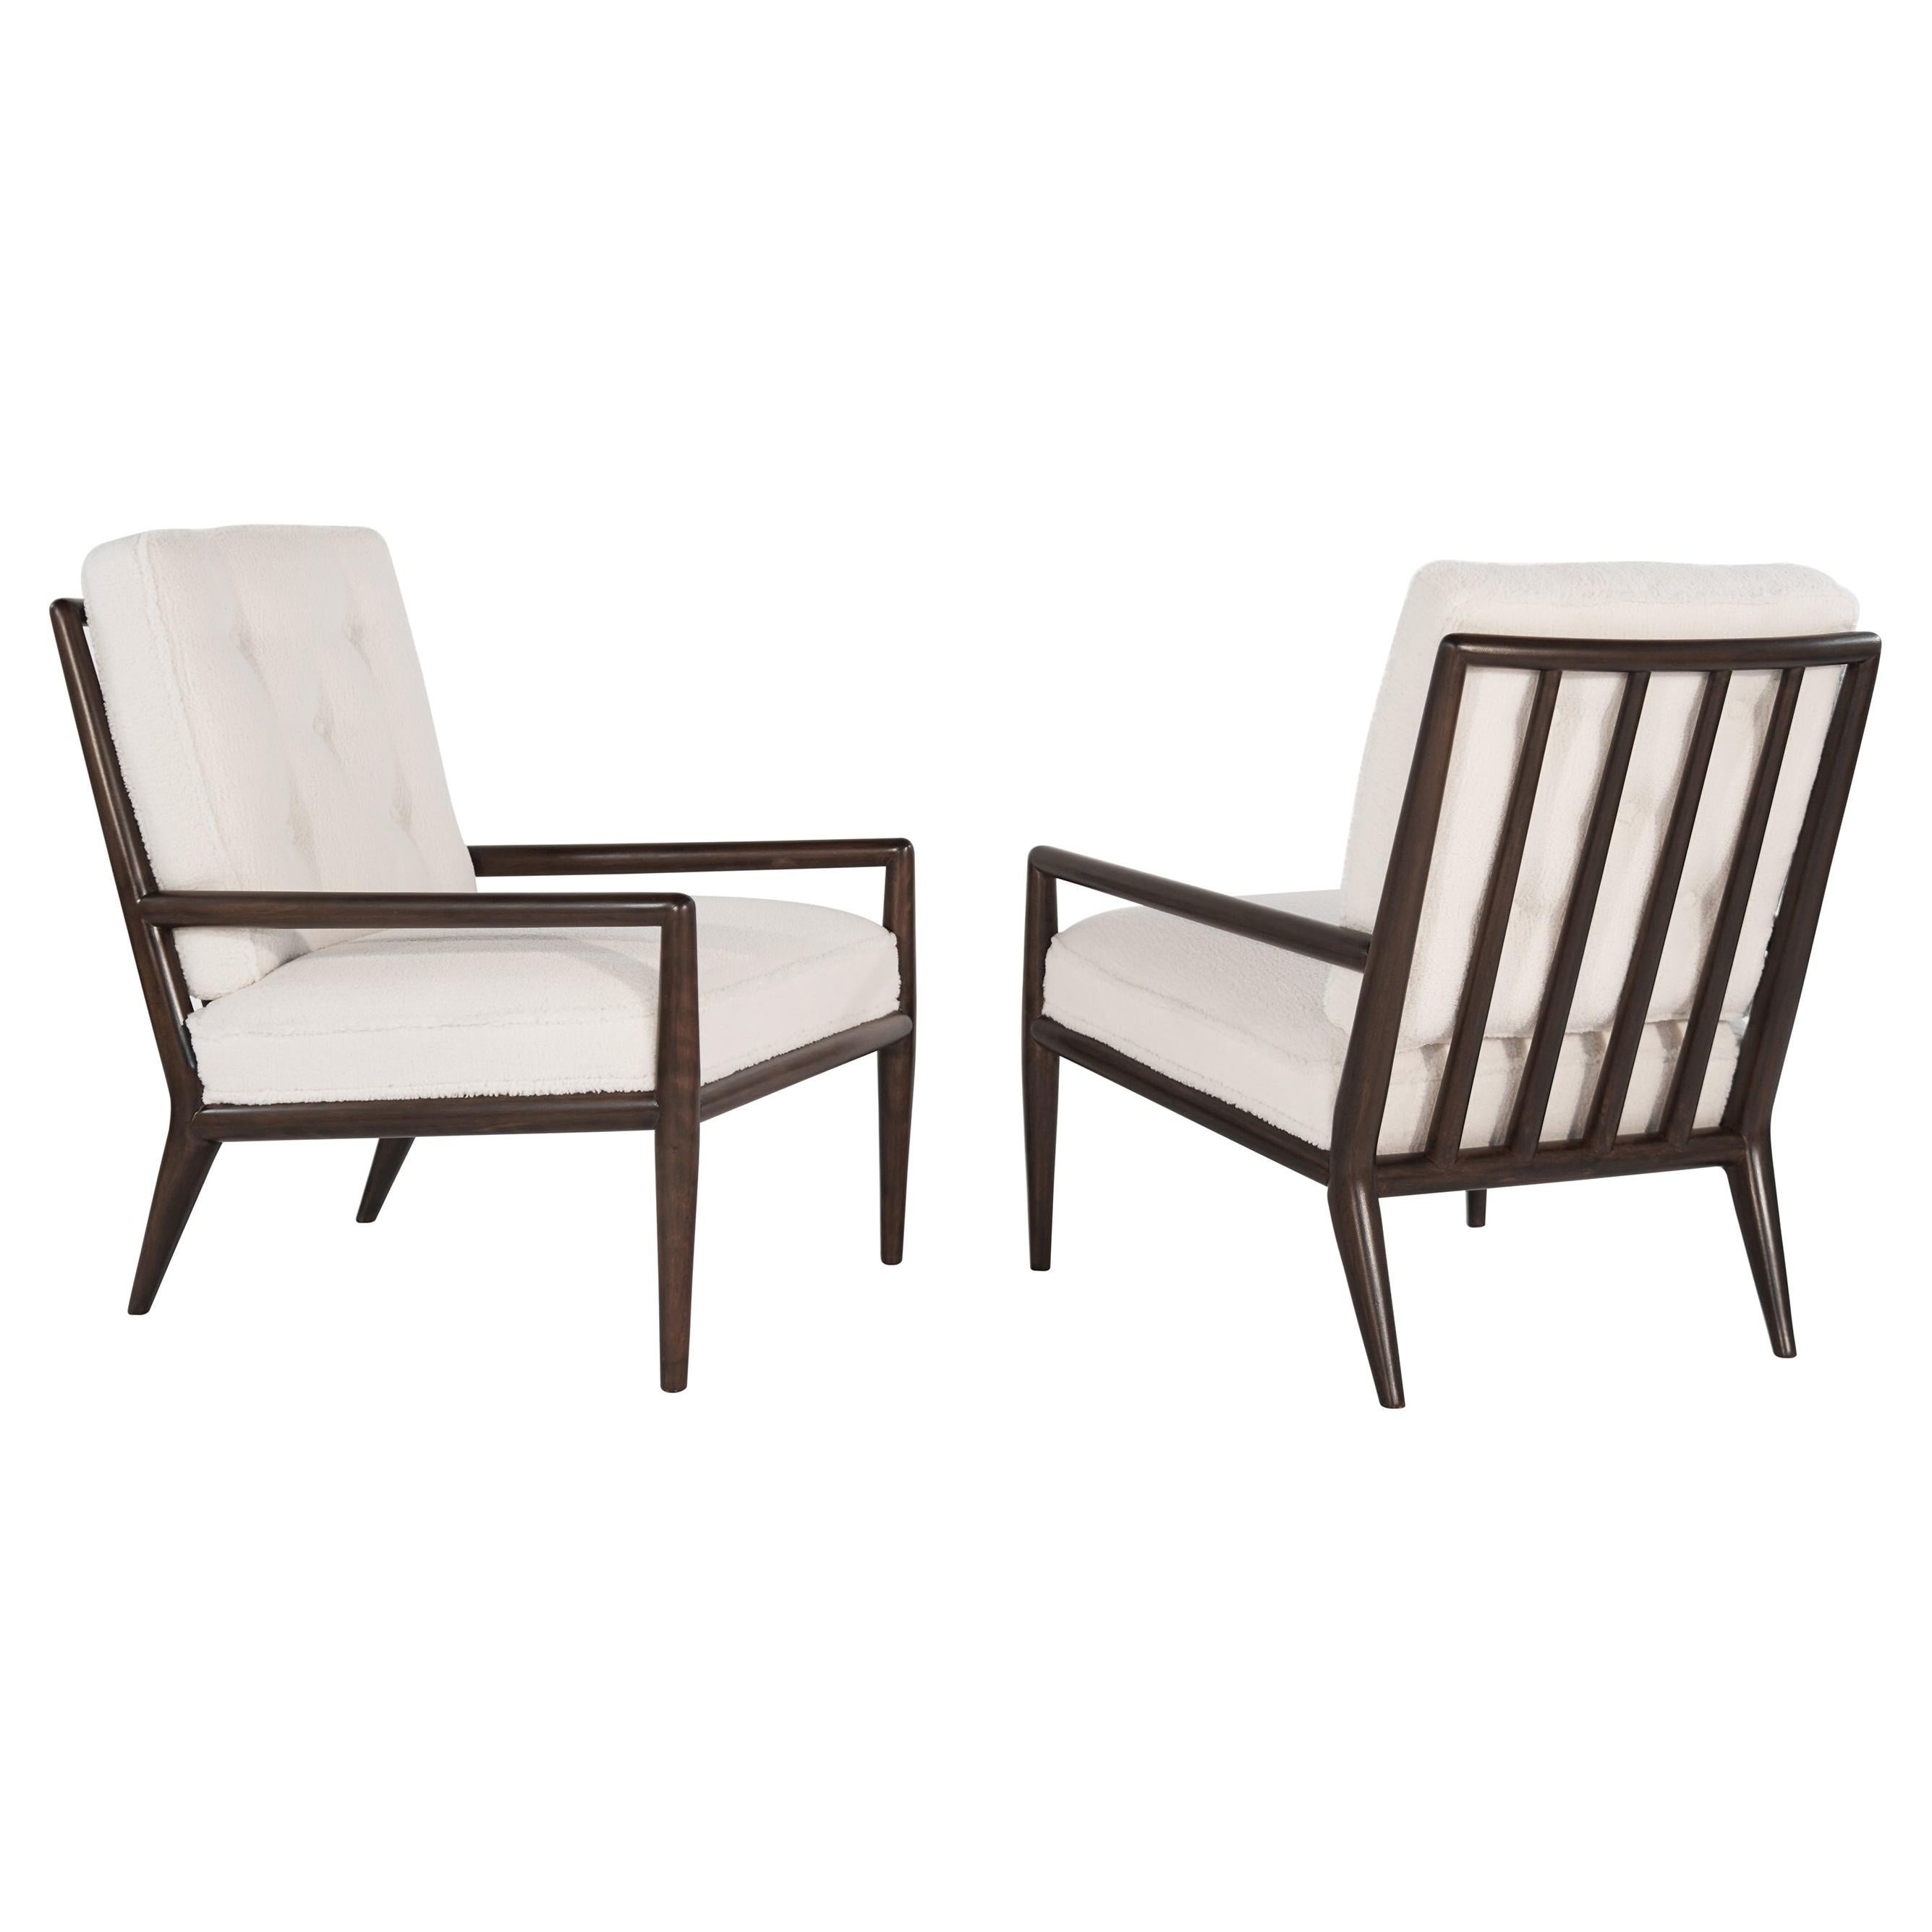 T.H. Robsjohn-Gibbings Lounge Chairs, 1950s